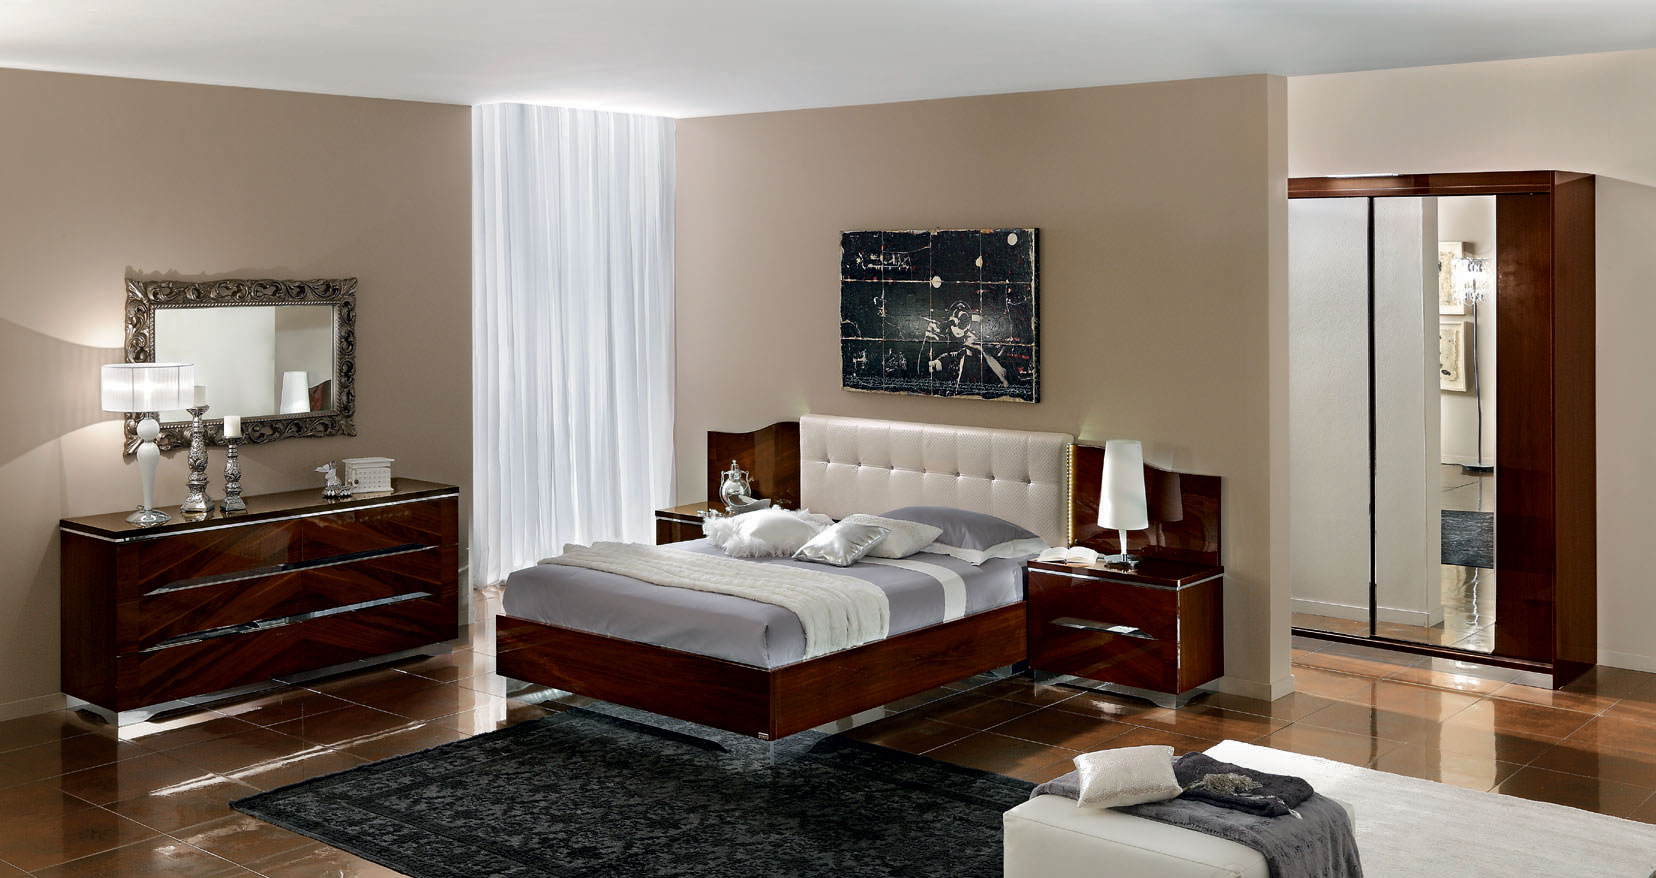 The Simplicity Of Modern Bedroom Furniture 2671  Bedroom